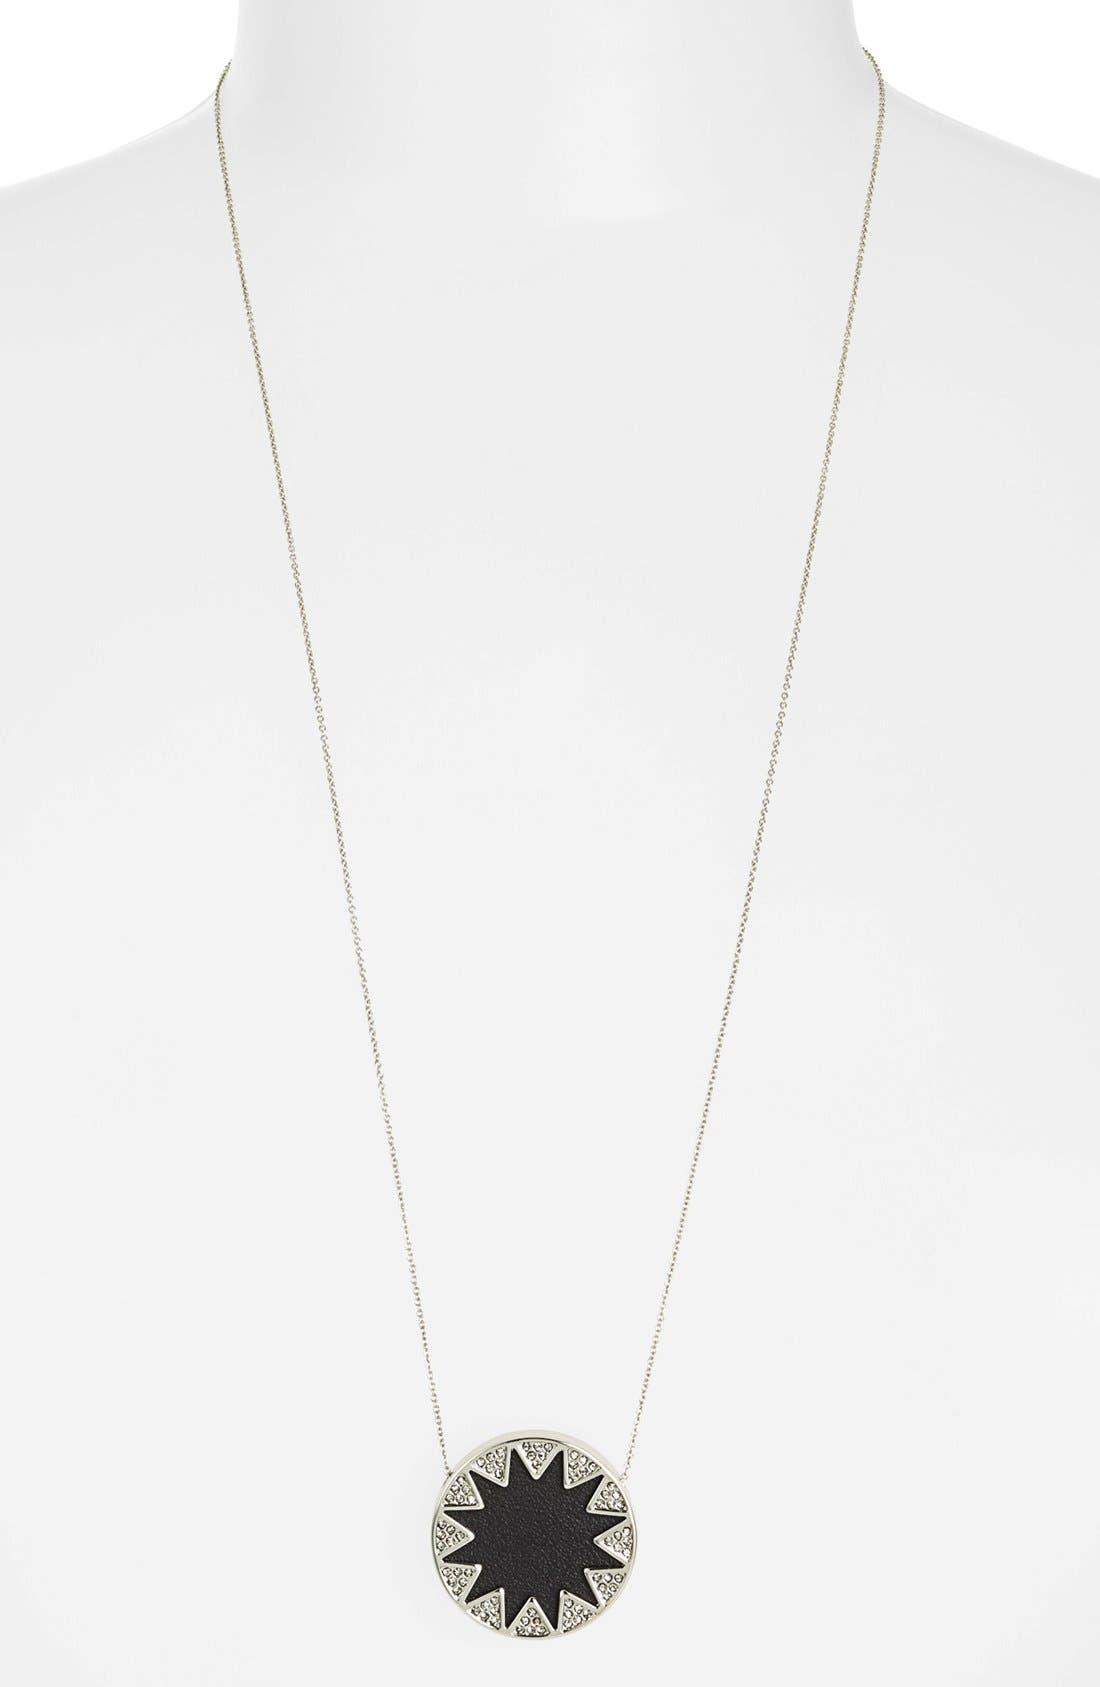 Main Image - House of Harlow 1960 Pavé Leather Sunburst Pendant Necklace